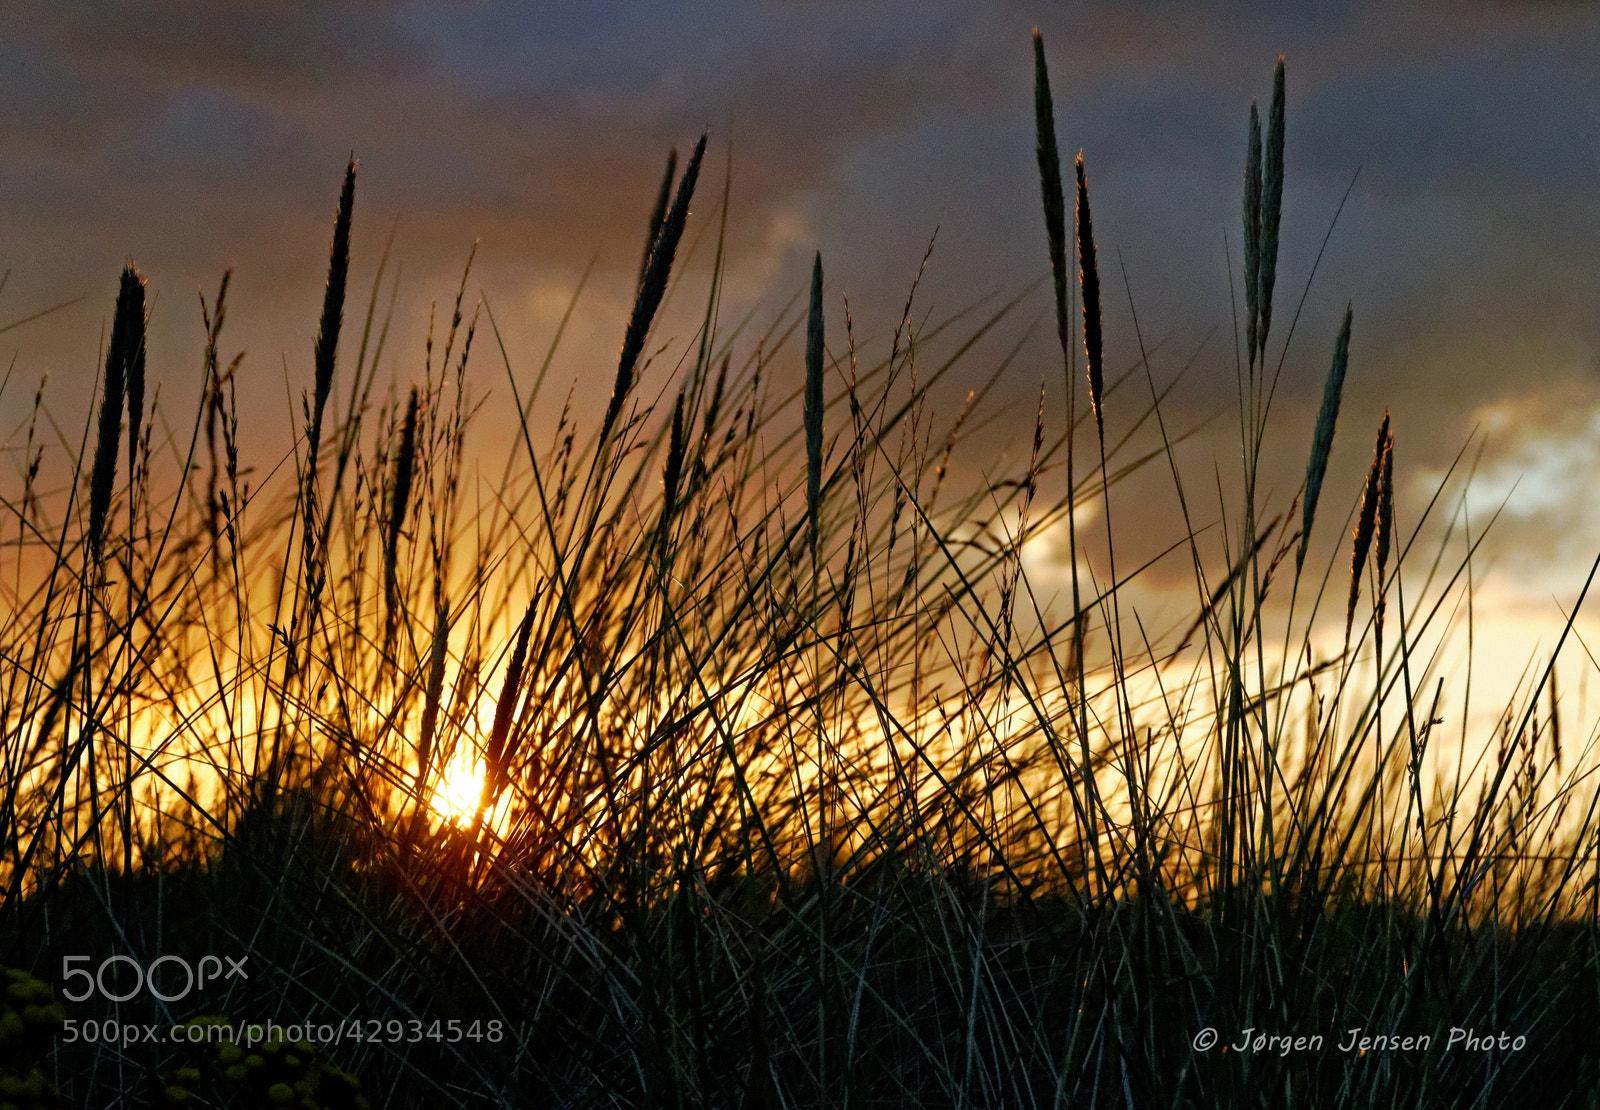 Photograph Sunset and lyme grass by Jørgen Jensen on 500px